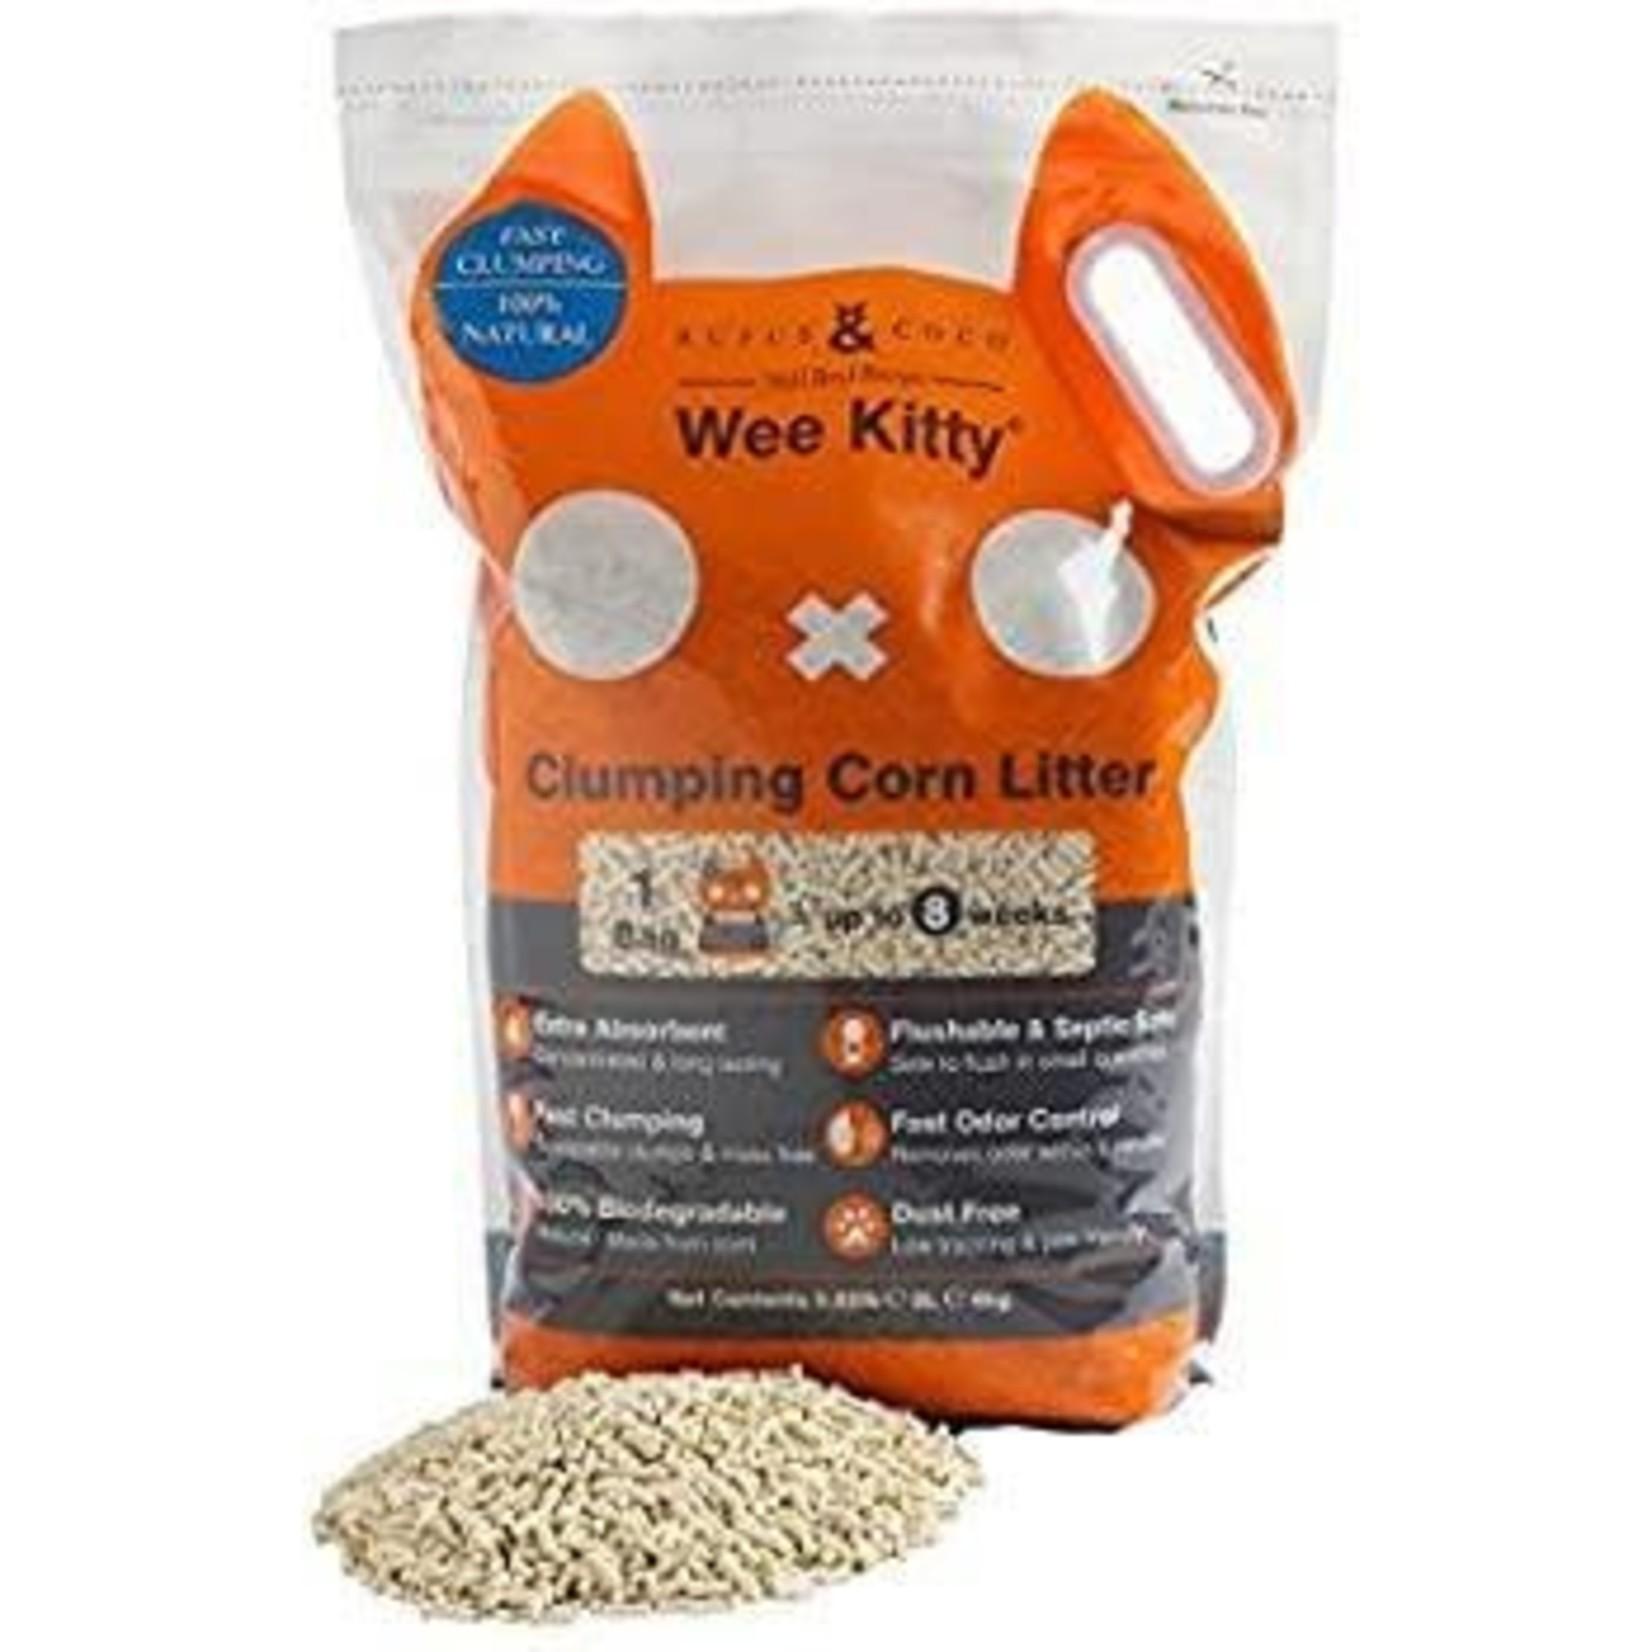 Rufus & Coco Clumping Corn Cat Litter  - Rufus & Coco (9kg)